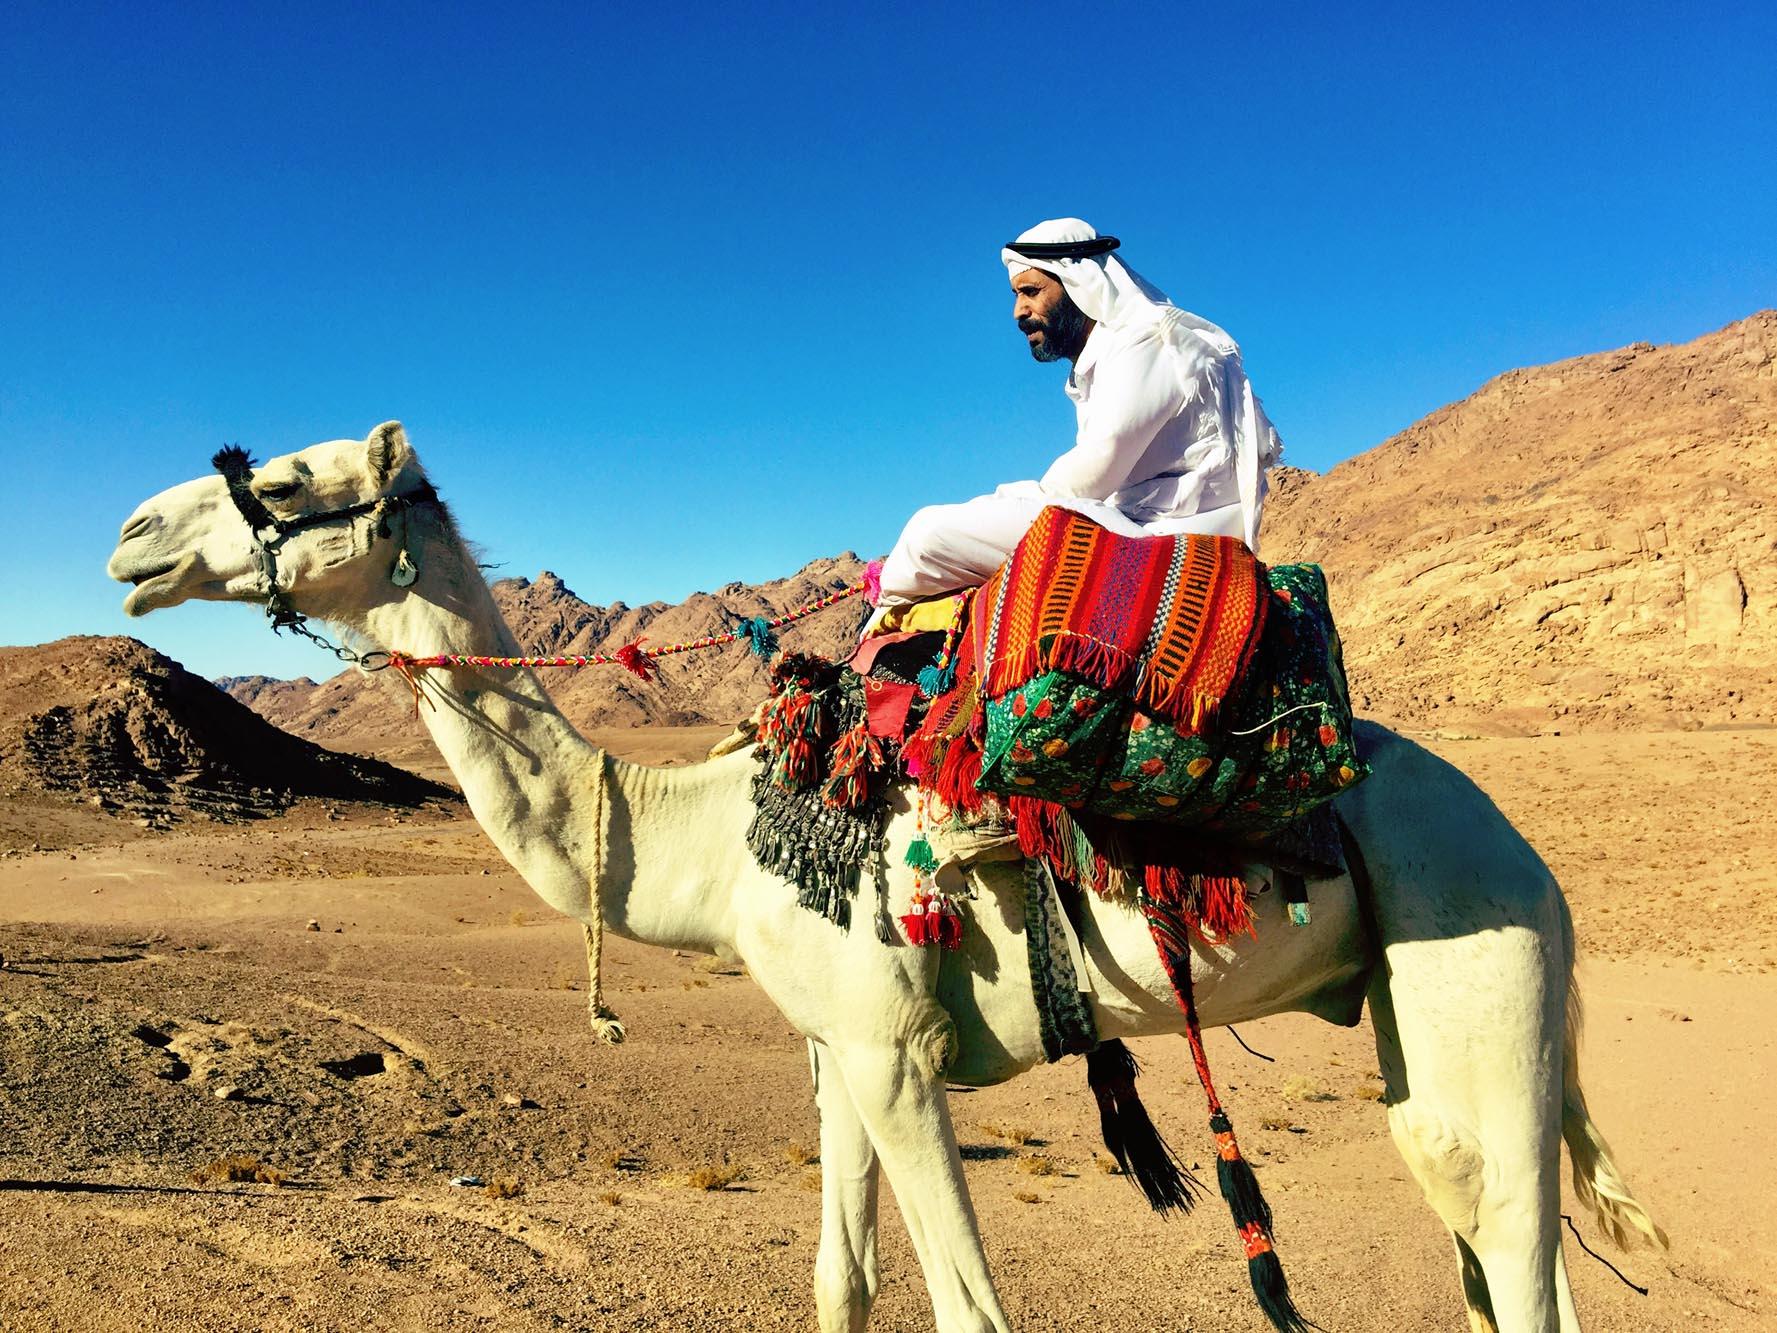 Mohamed on his camel in St Katherine